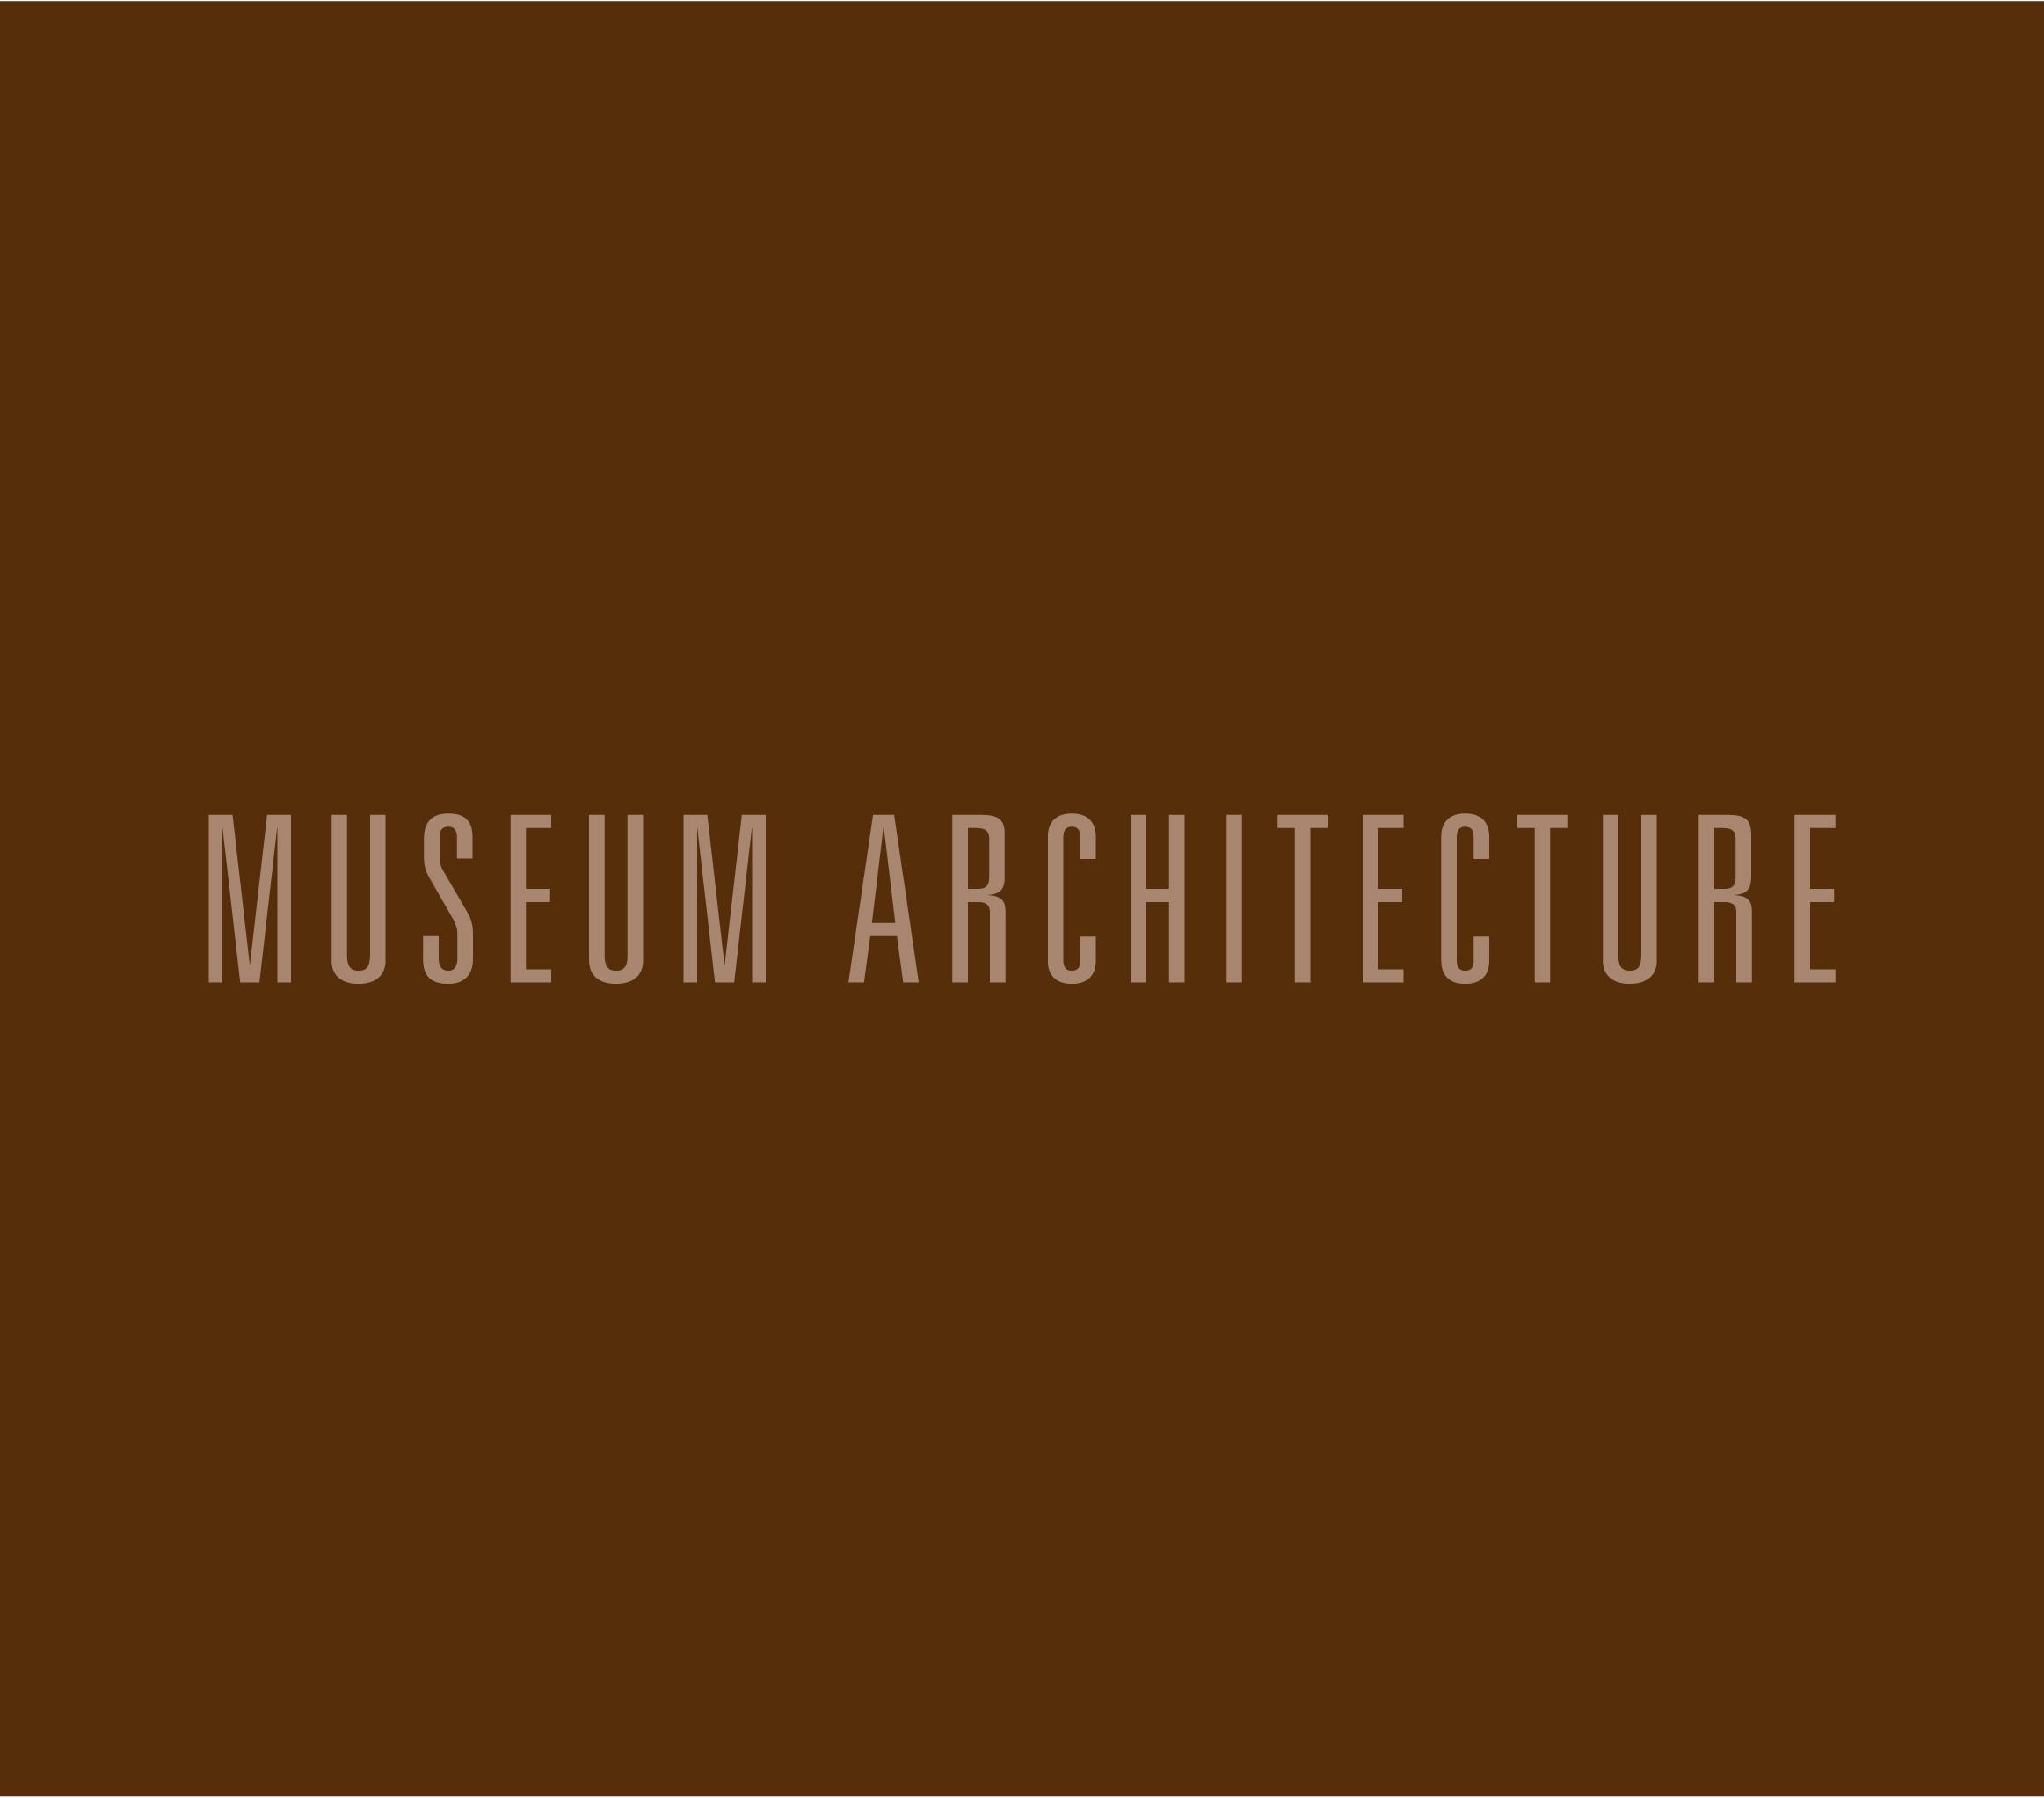 logos_Museum Architecture copy.jpg